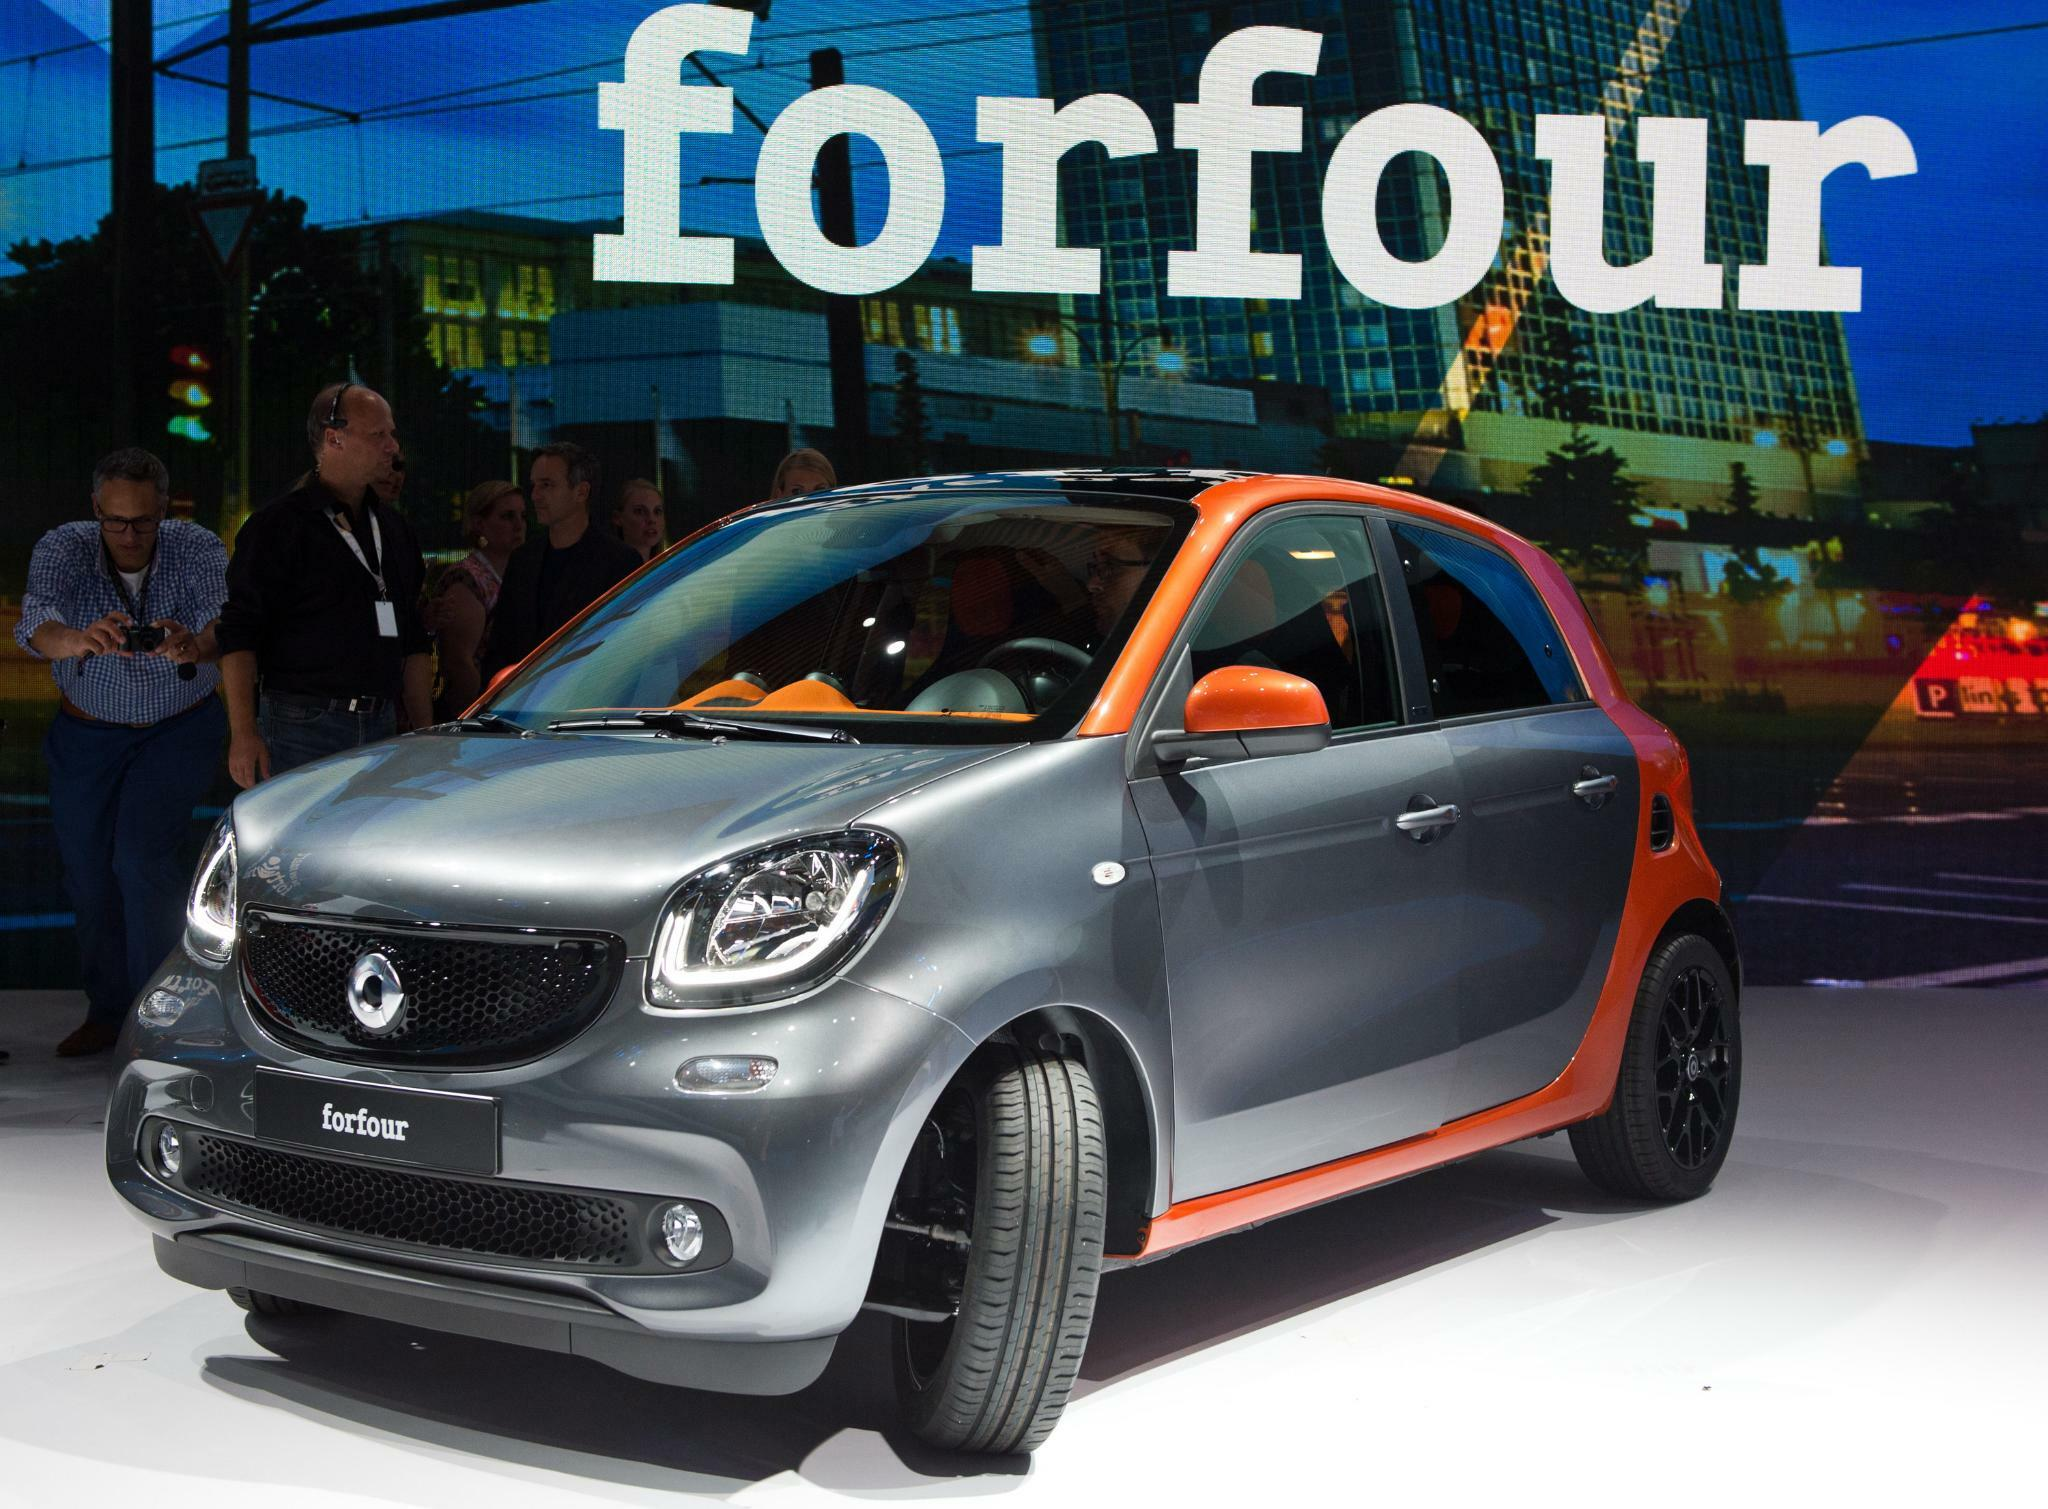 Dubioses Smart-Zulassungsverfahren bringt Daimler und KBA in Erklärungsnot